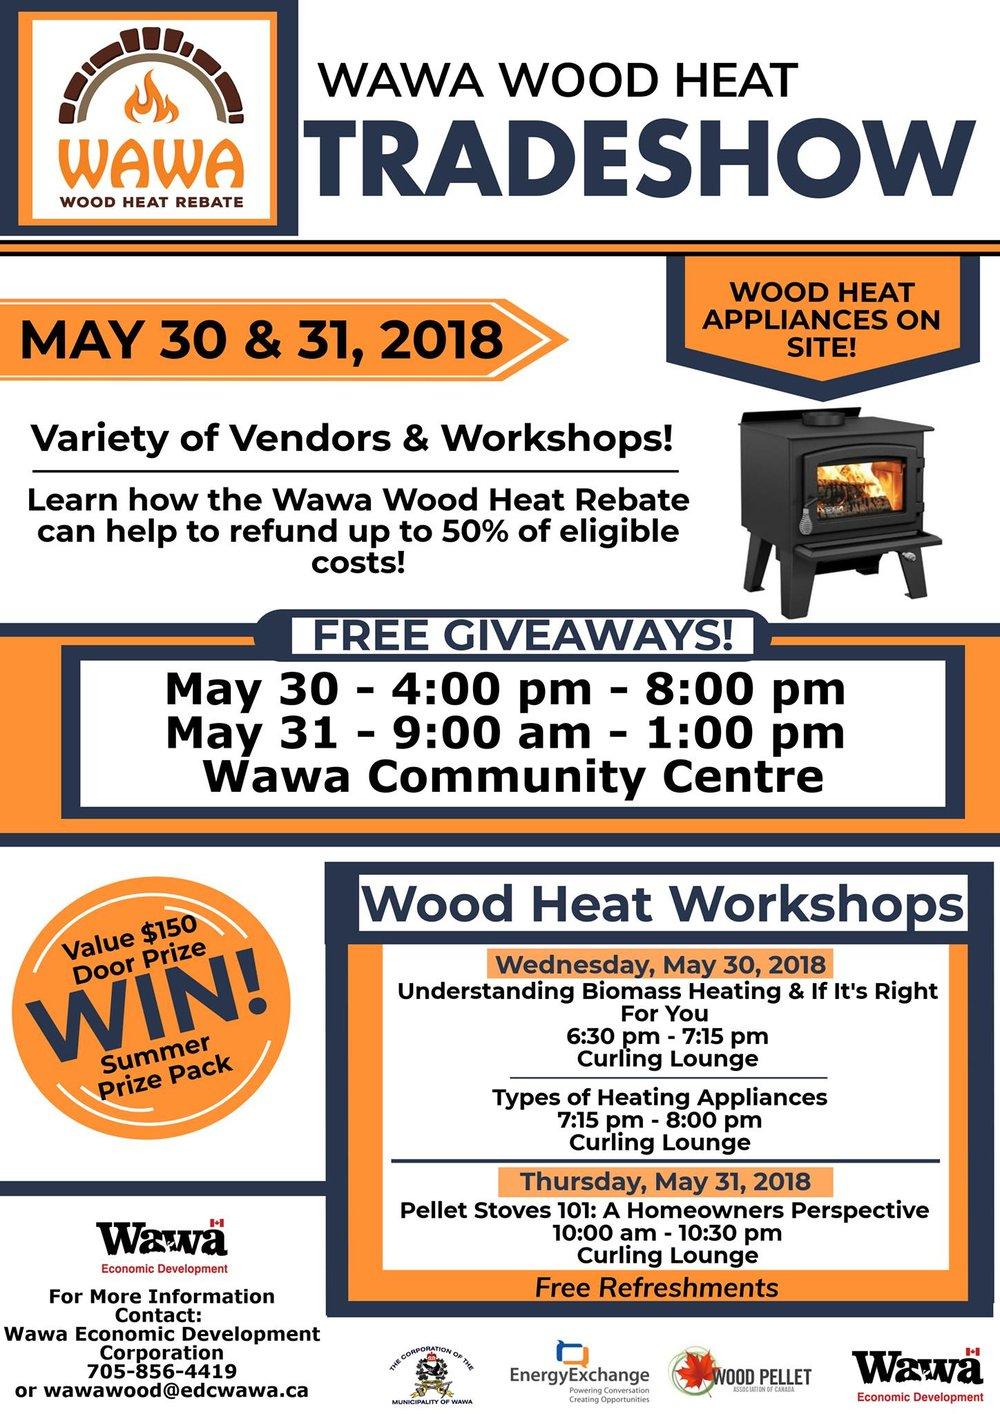 Wawa Wood Heat Tradeshow.jpg